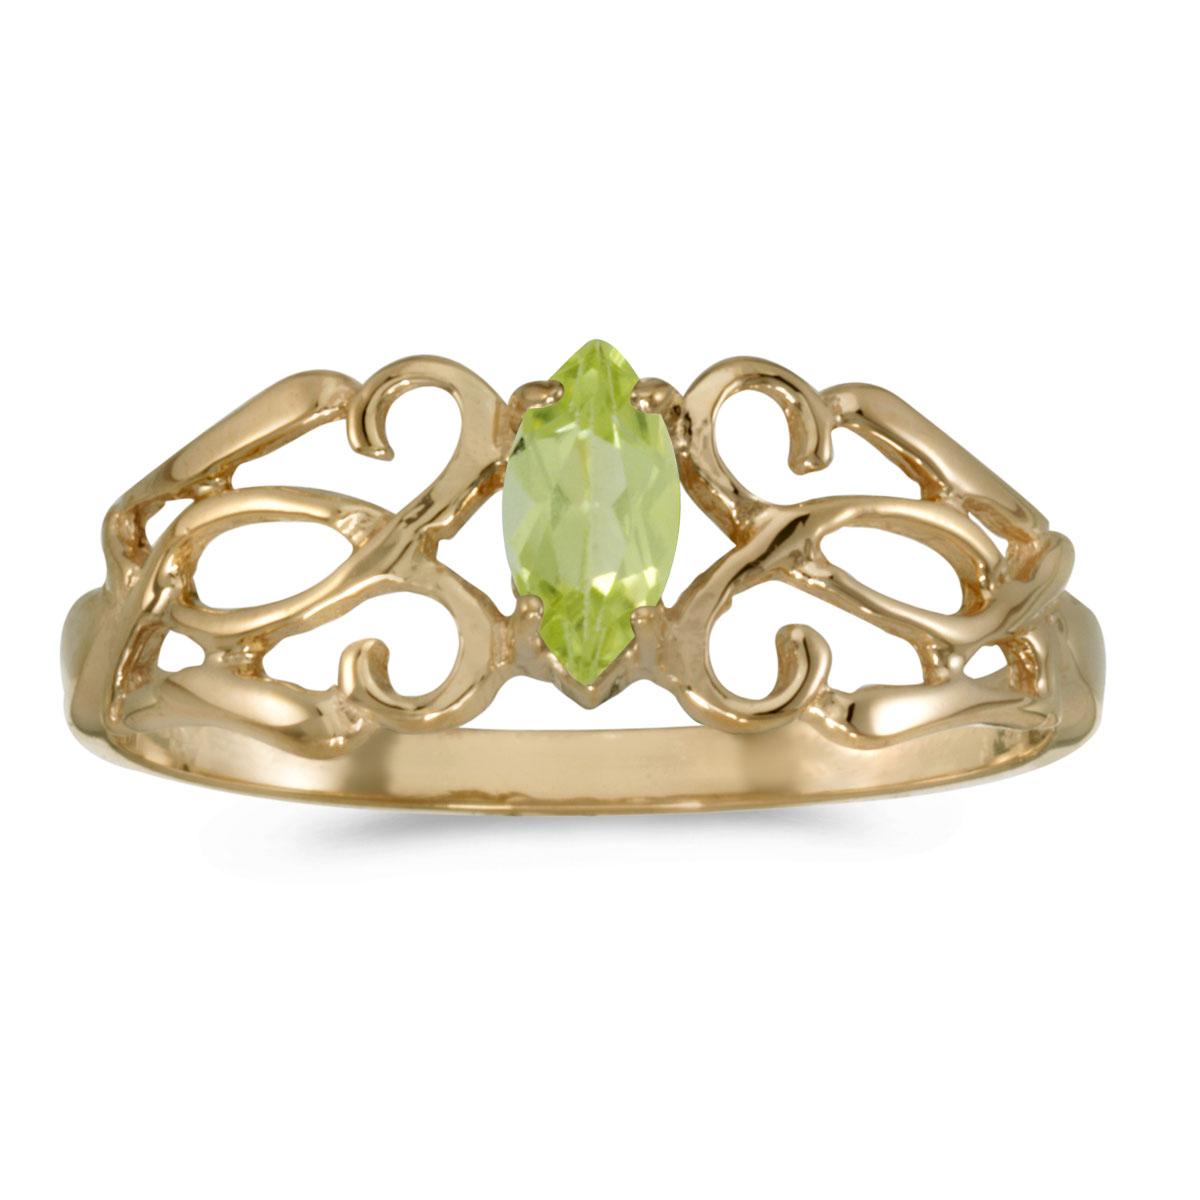 Direct-Jewelry 10k Yellow Gold Marquise Peridot filigree Ring